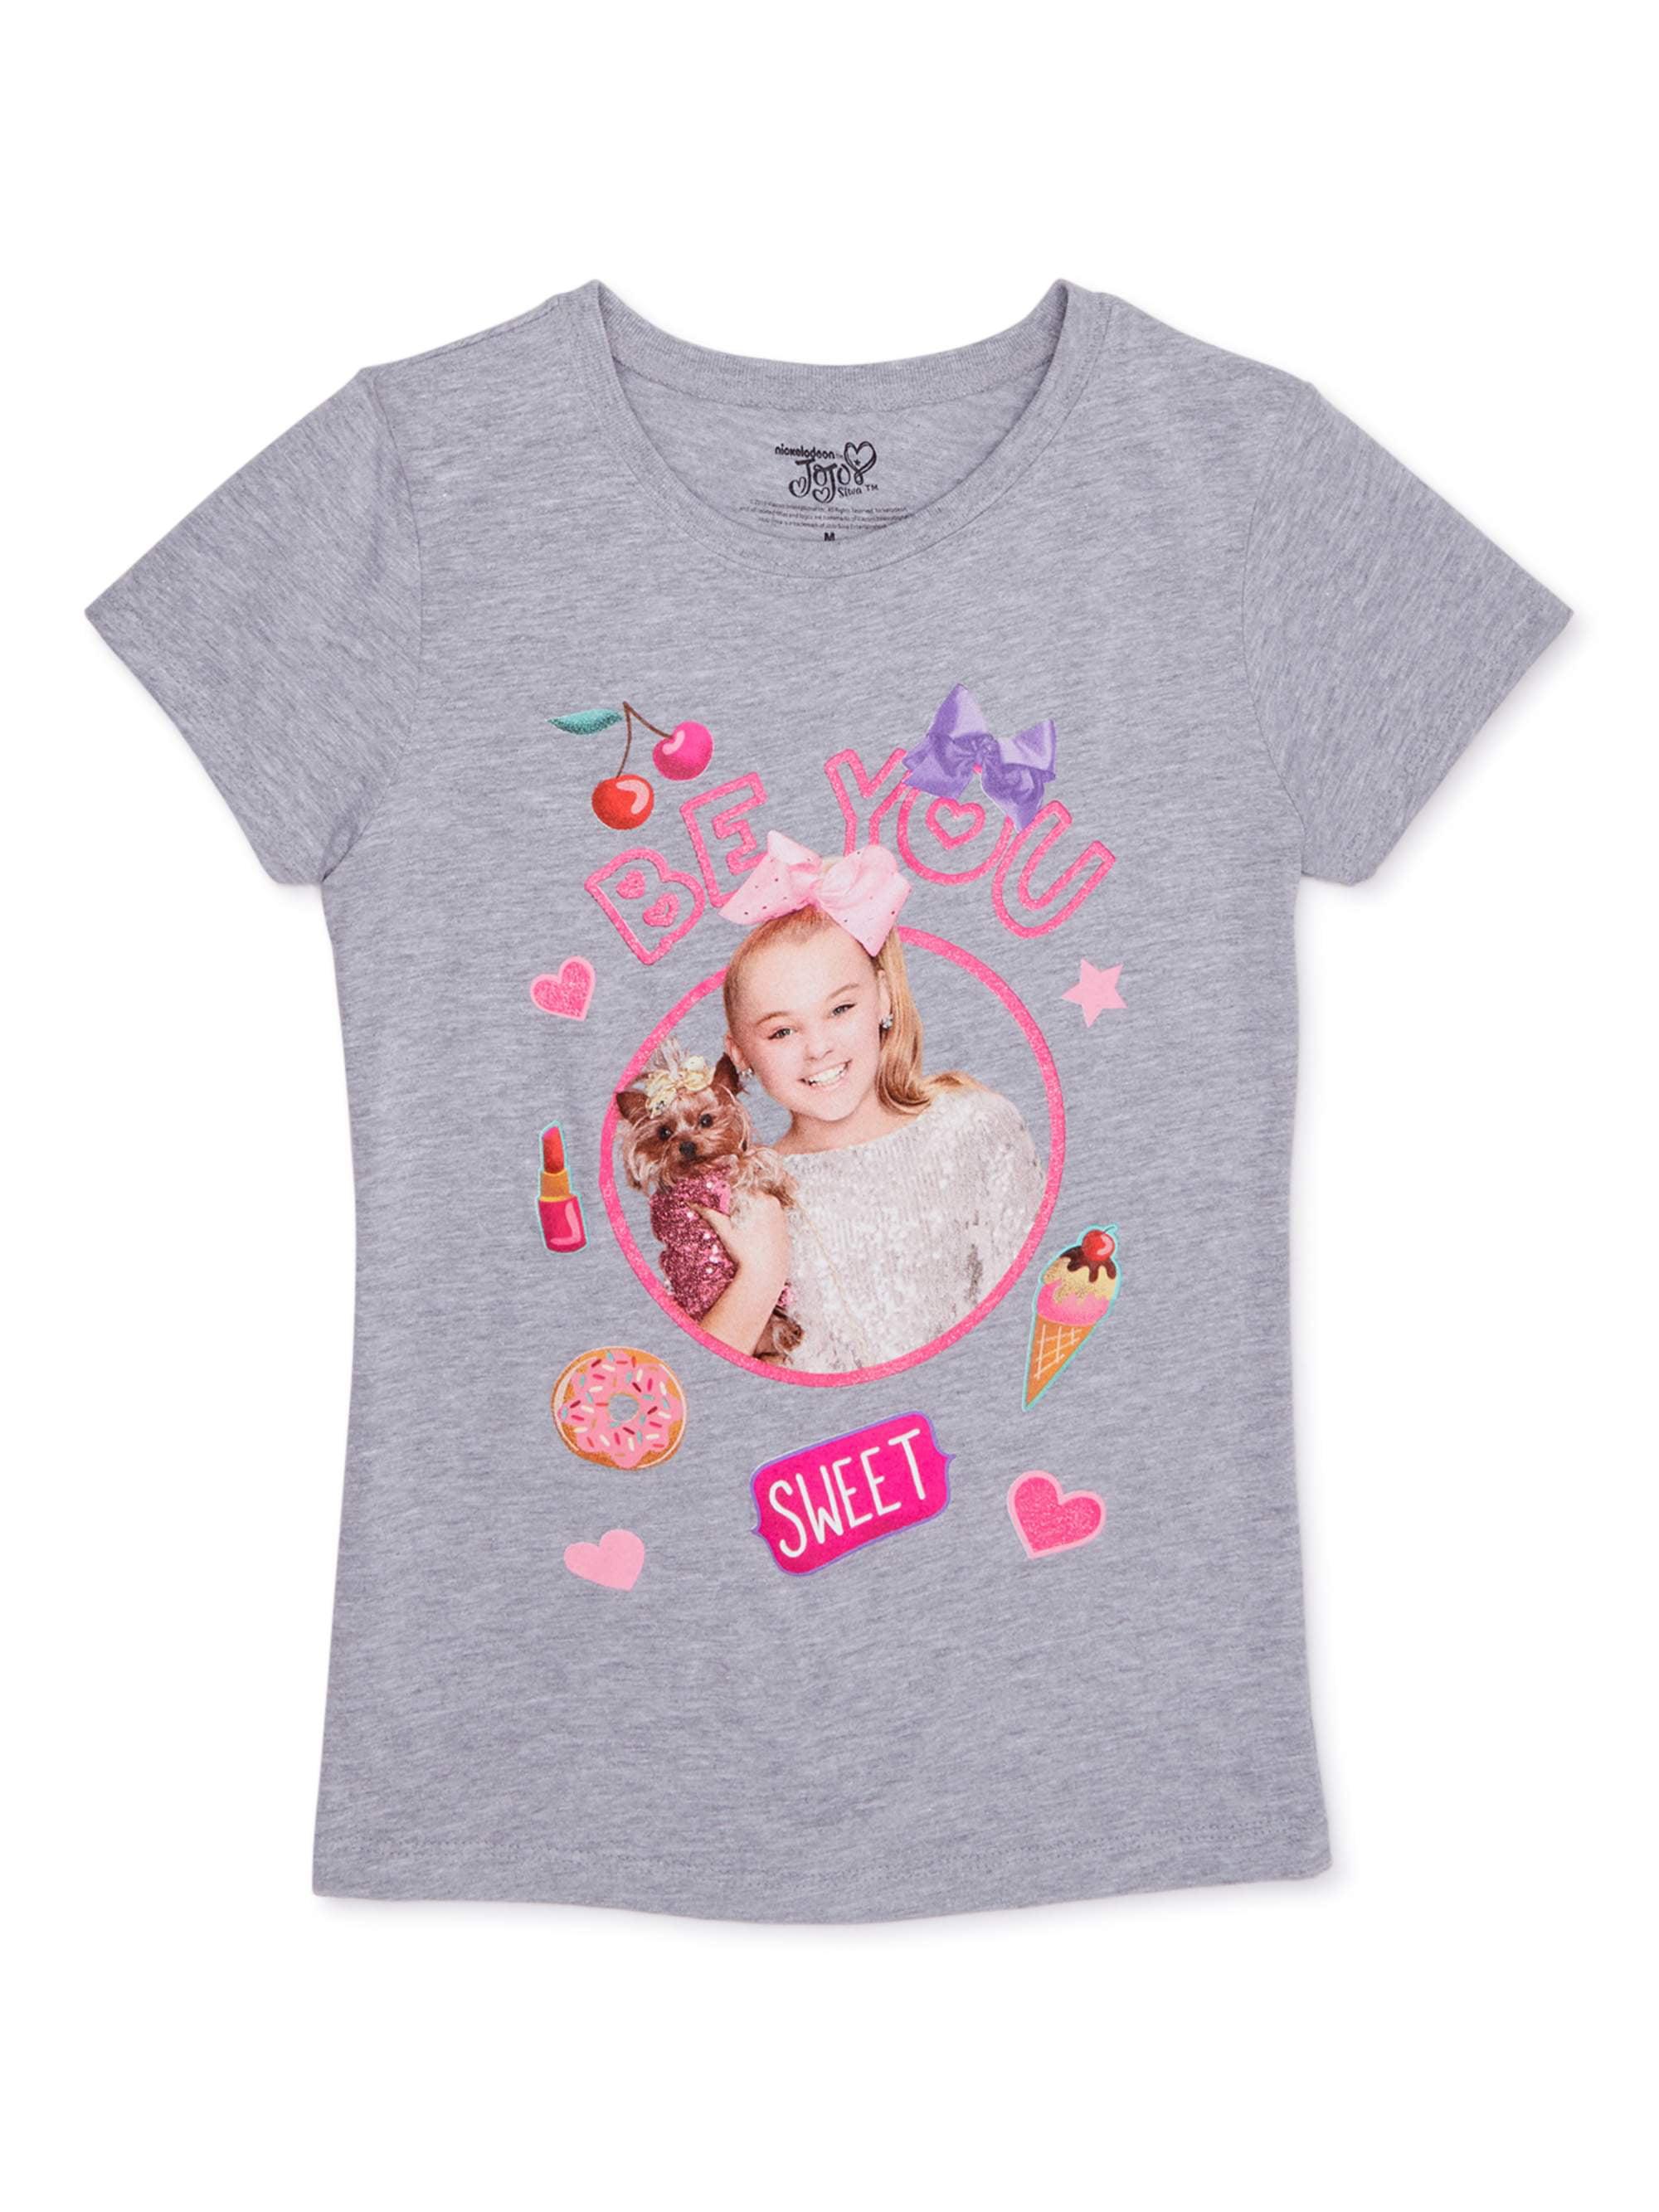 Kids Surprise Doll Costume T-shirt+Jeans Jojo Siwa Spiderman Shirt Top+Pants Set